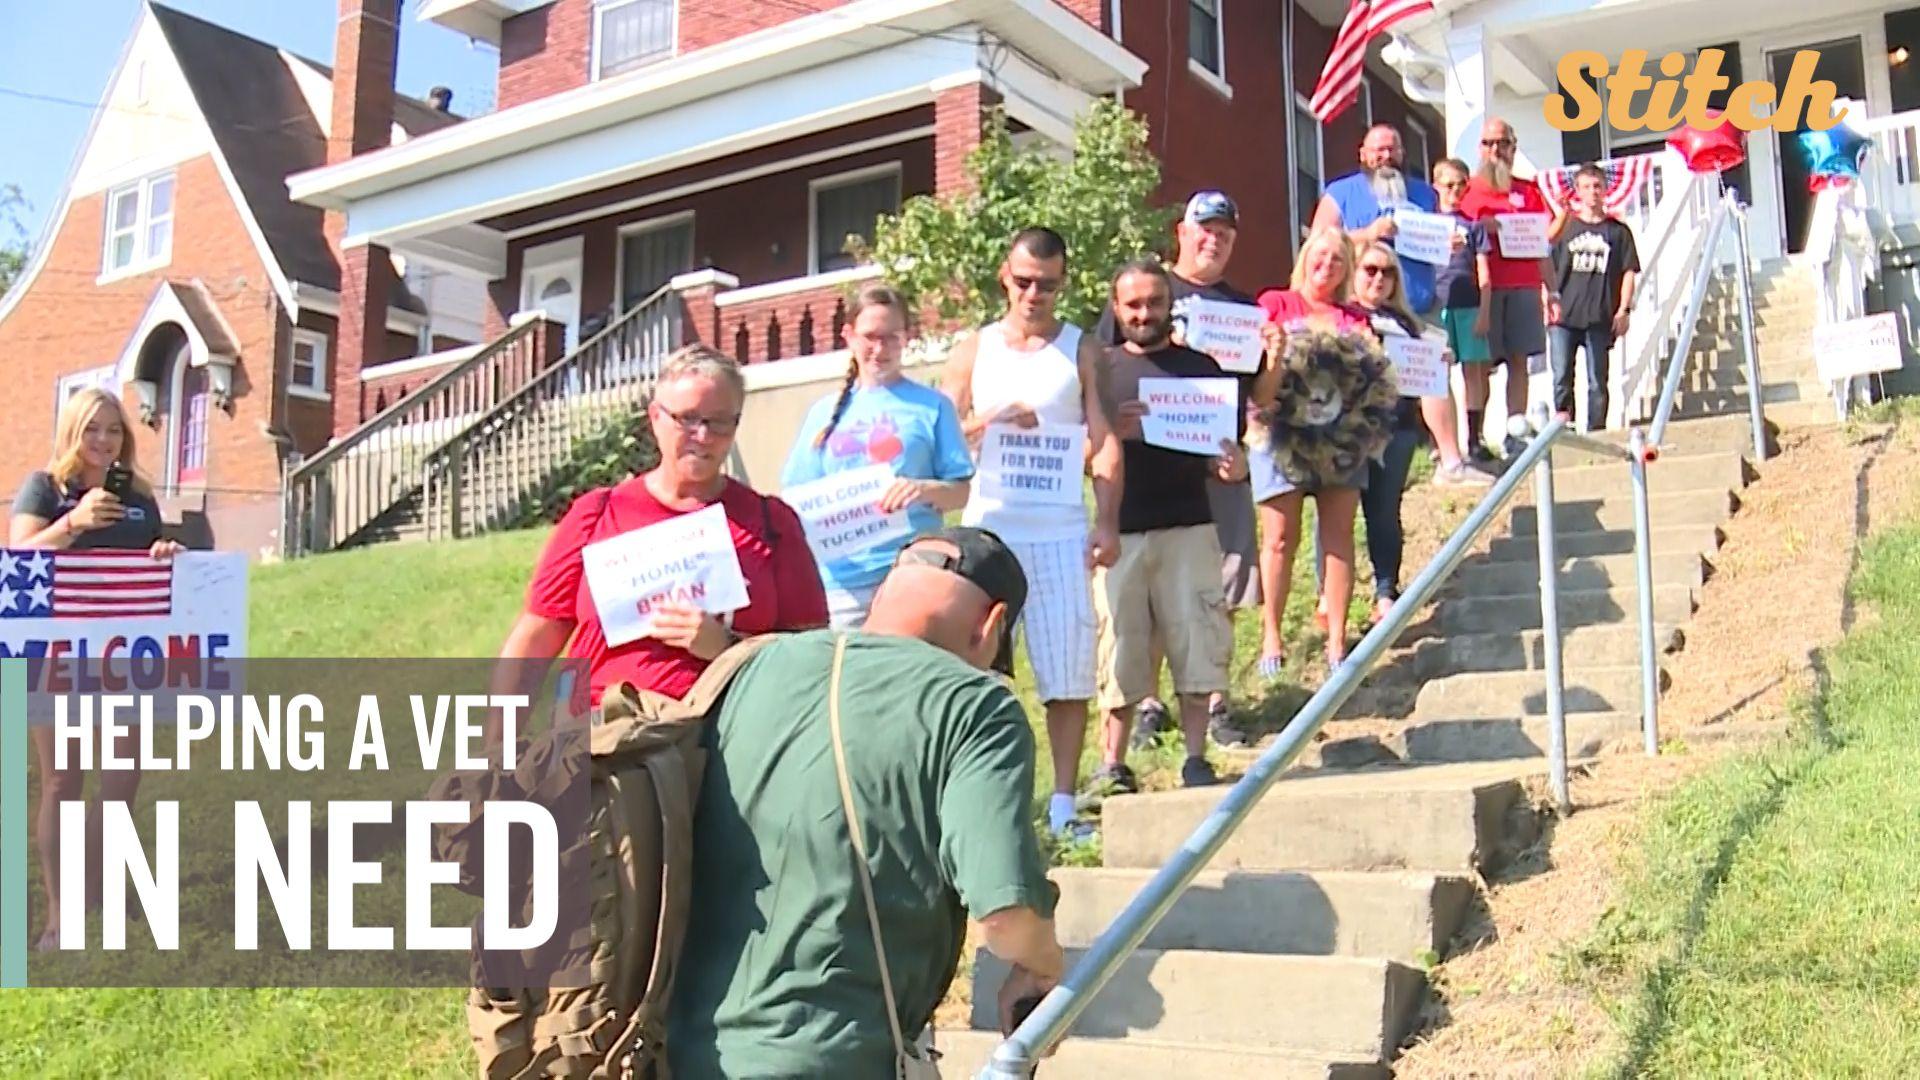 https://www mynbc5 com/article/video-wet-to-start-next-week-8-11-19